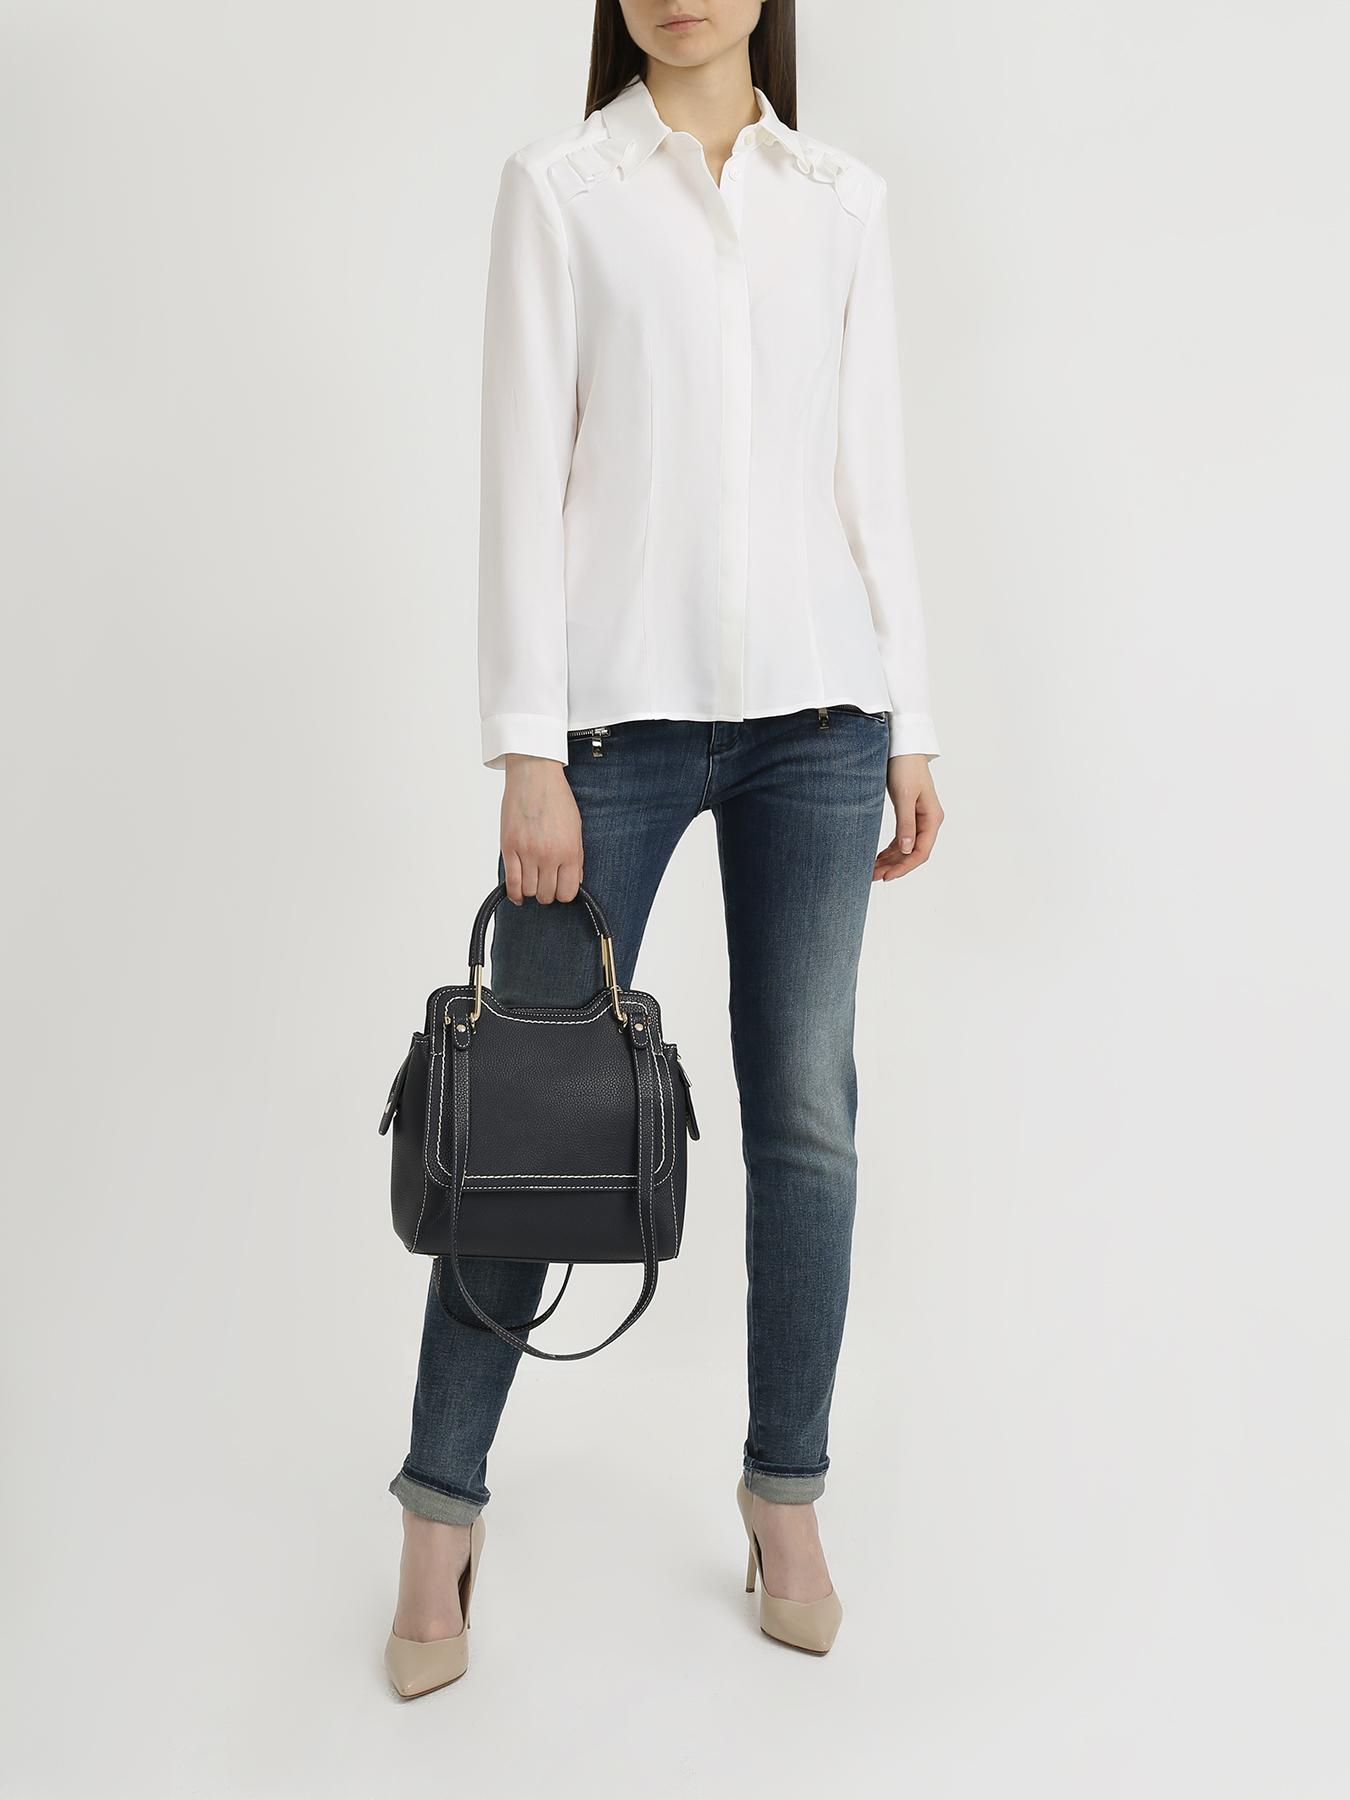 Фото - Сумка ORSA Женская сумка сумка